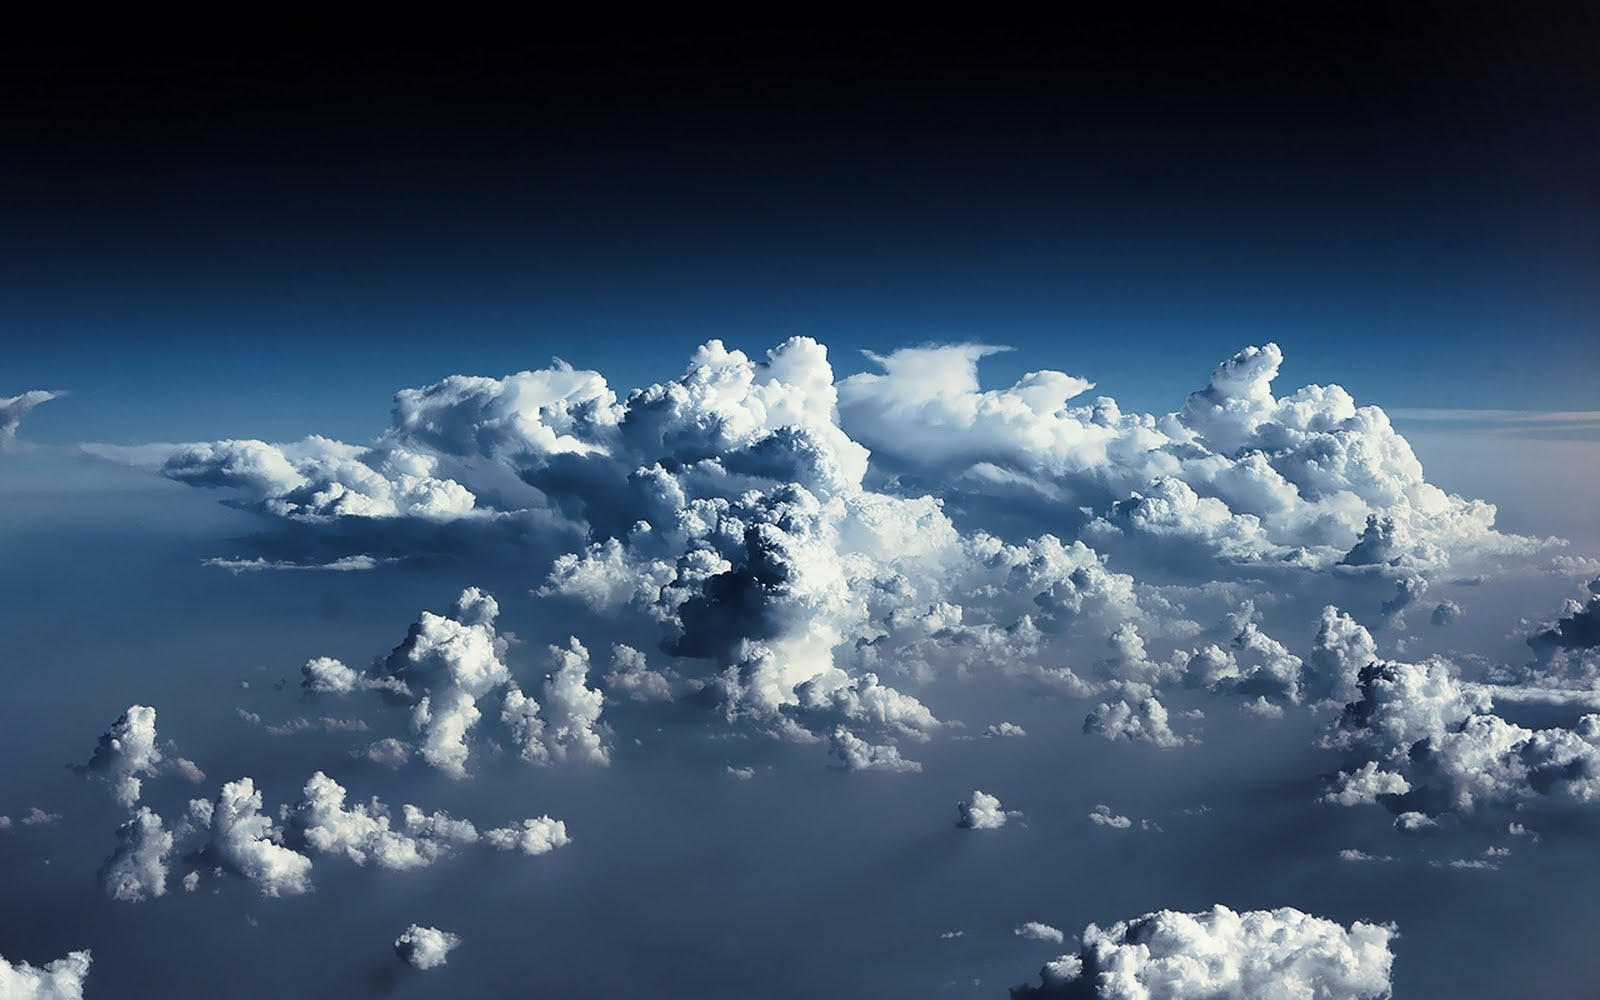 Clouds Wallpaper 037